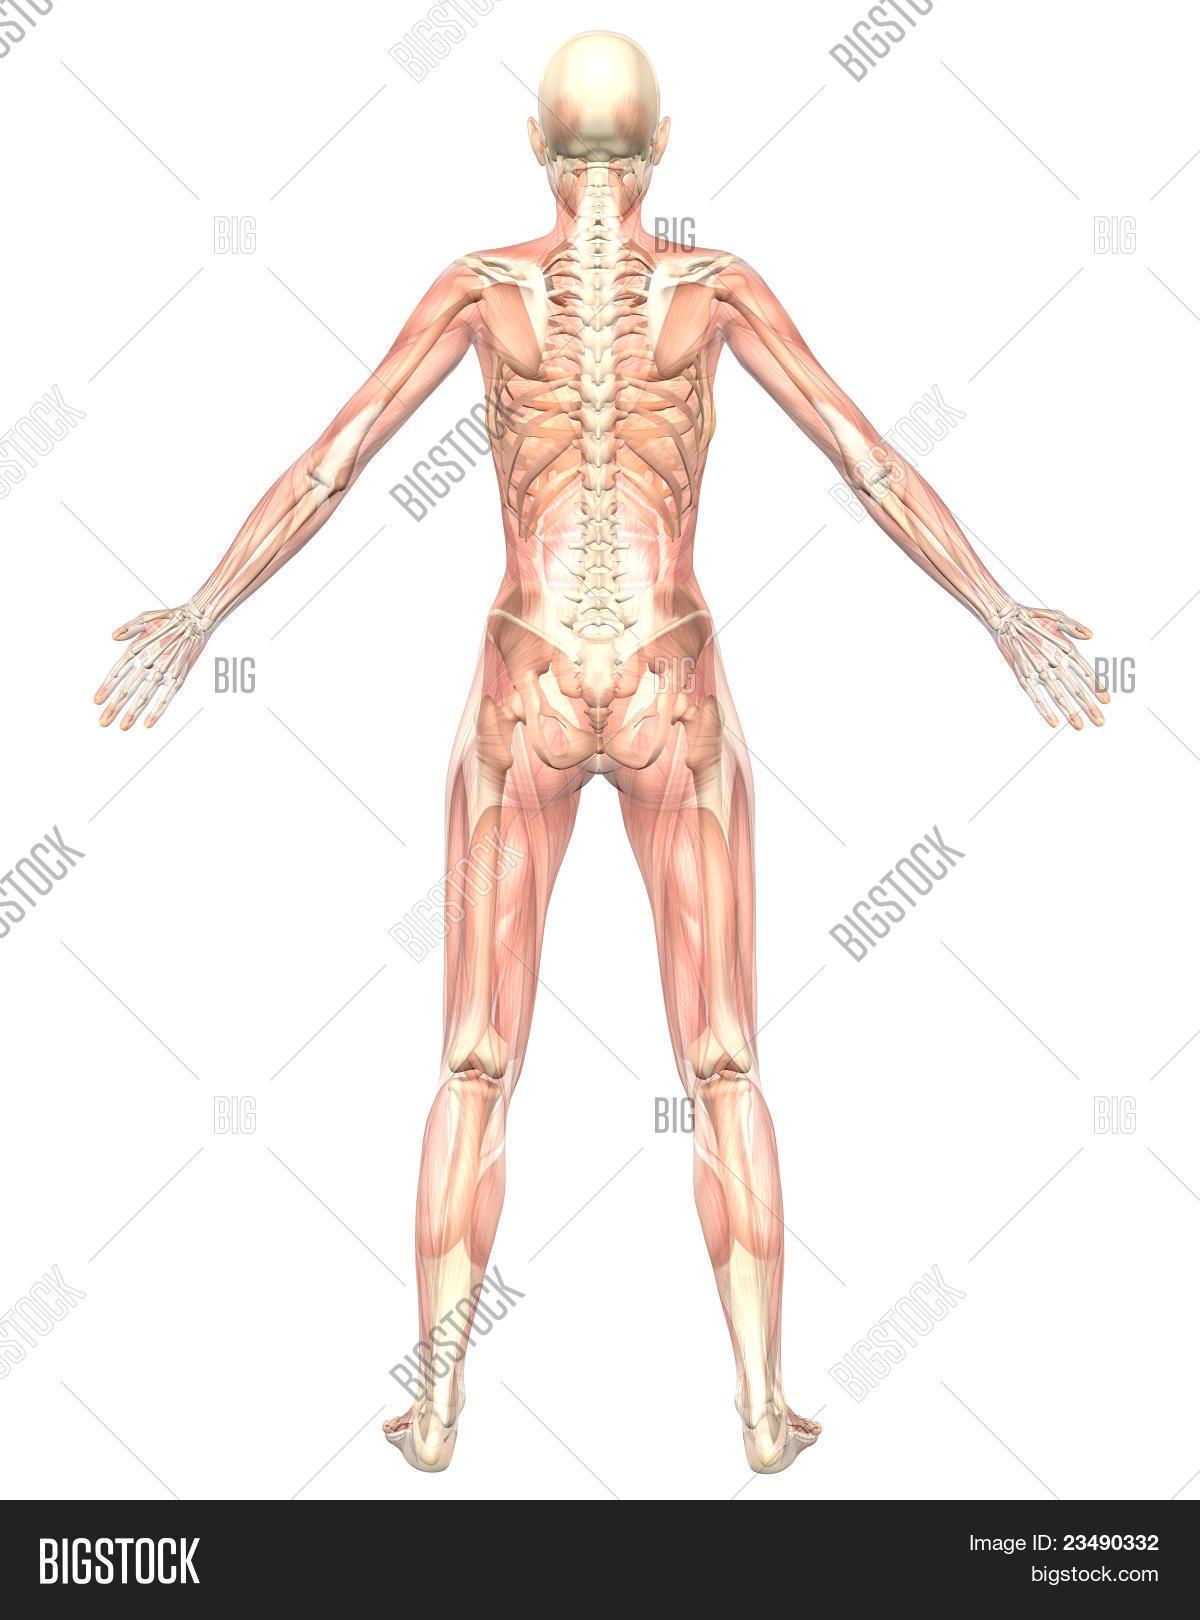 Imagen y foto Anatomí Muscular Femenina Semi | Bigstock